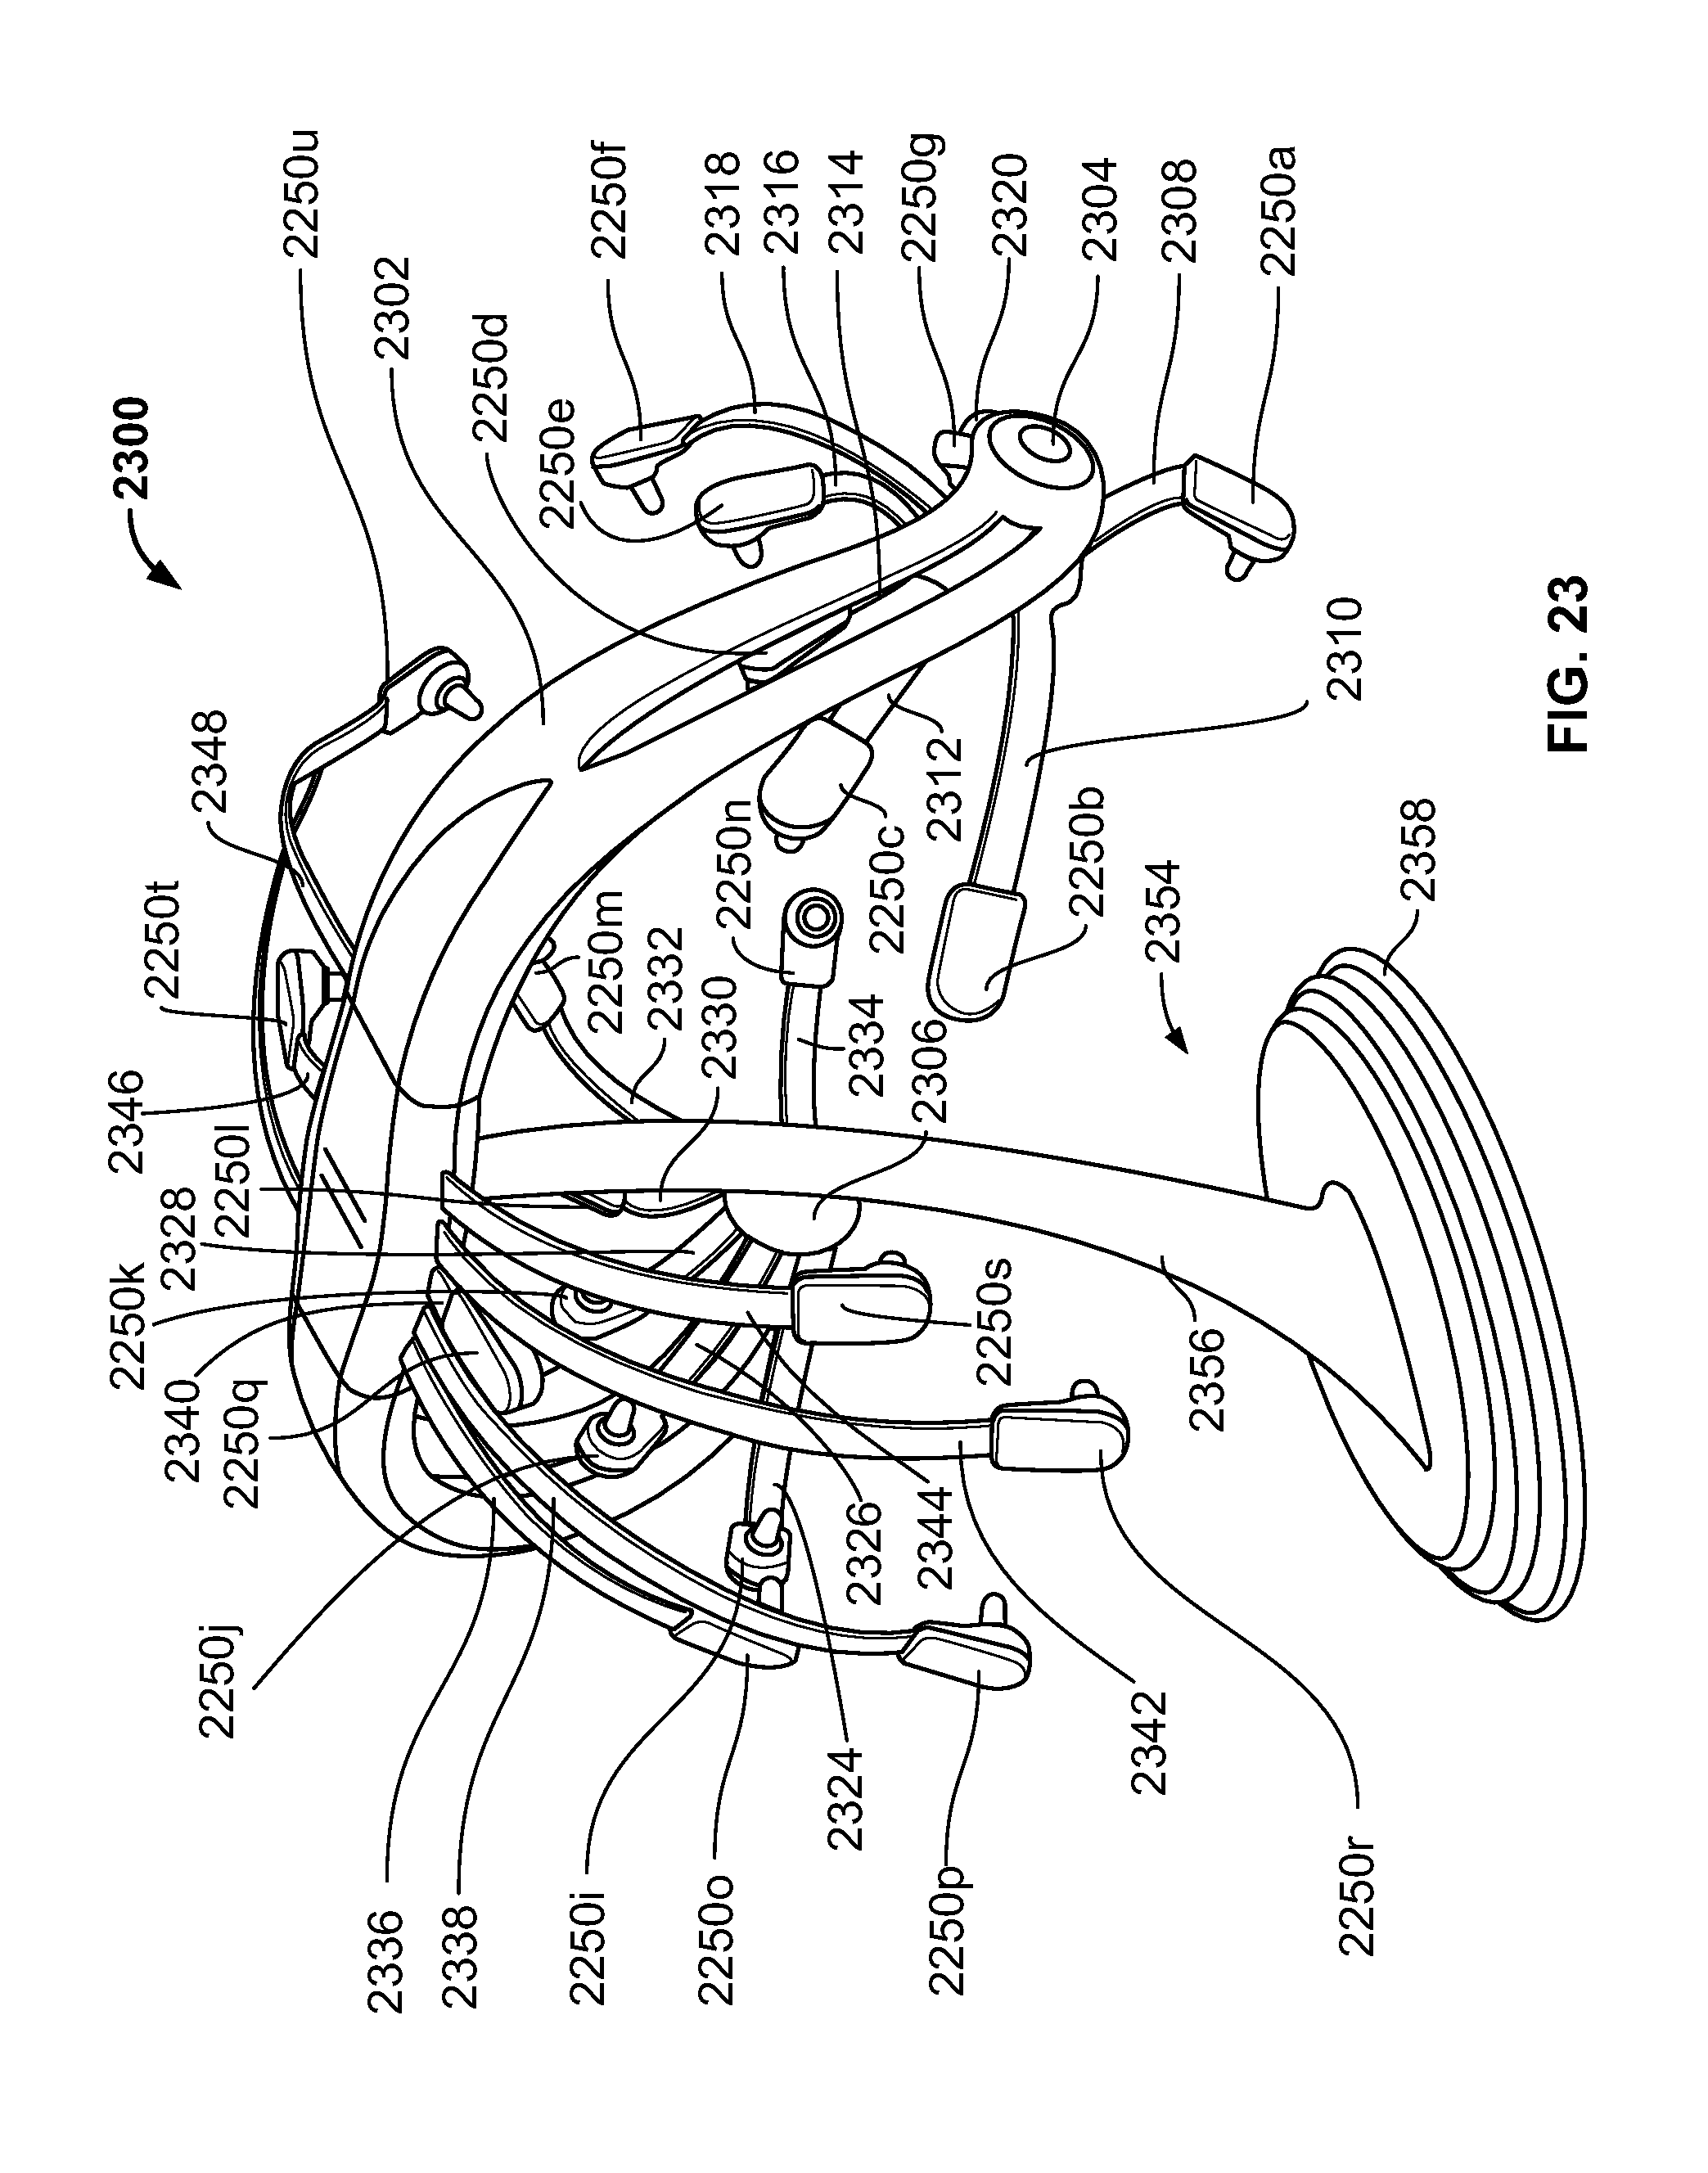 Patent US 8,989,835 B2